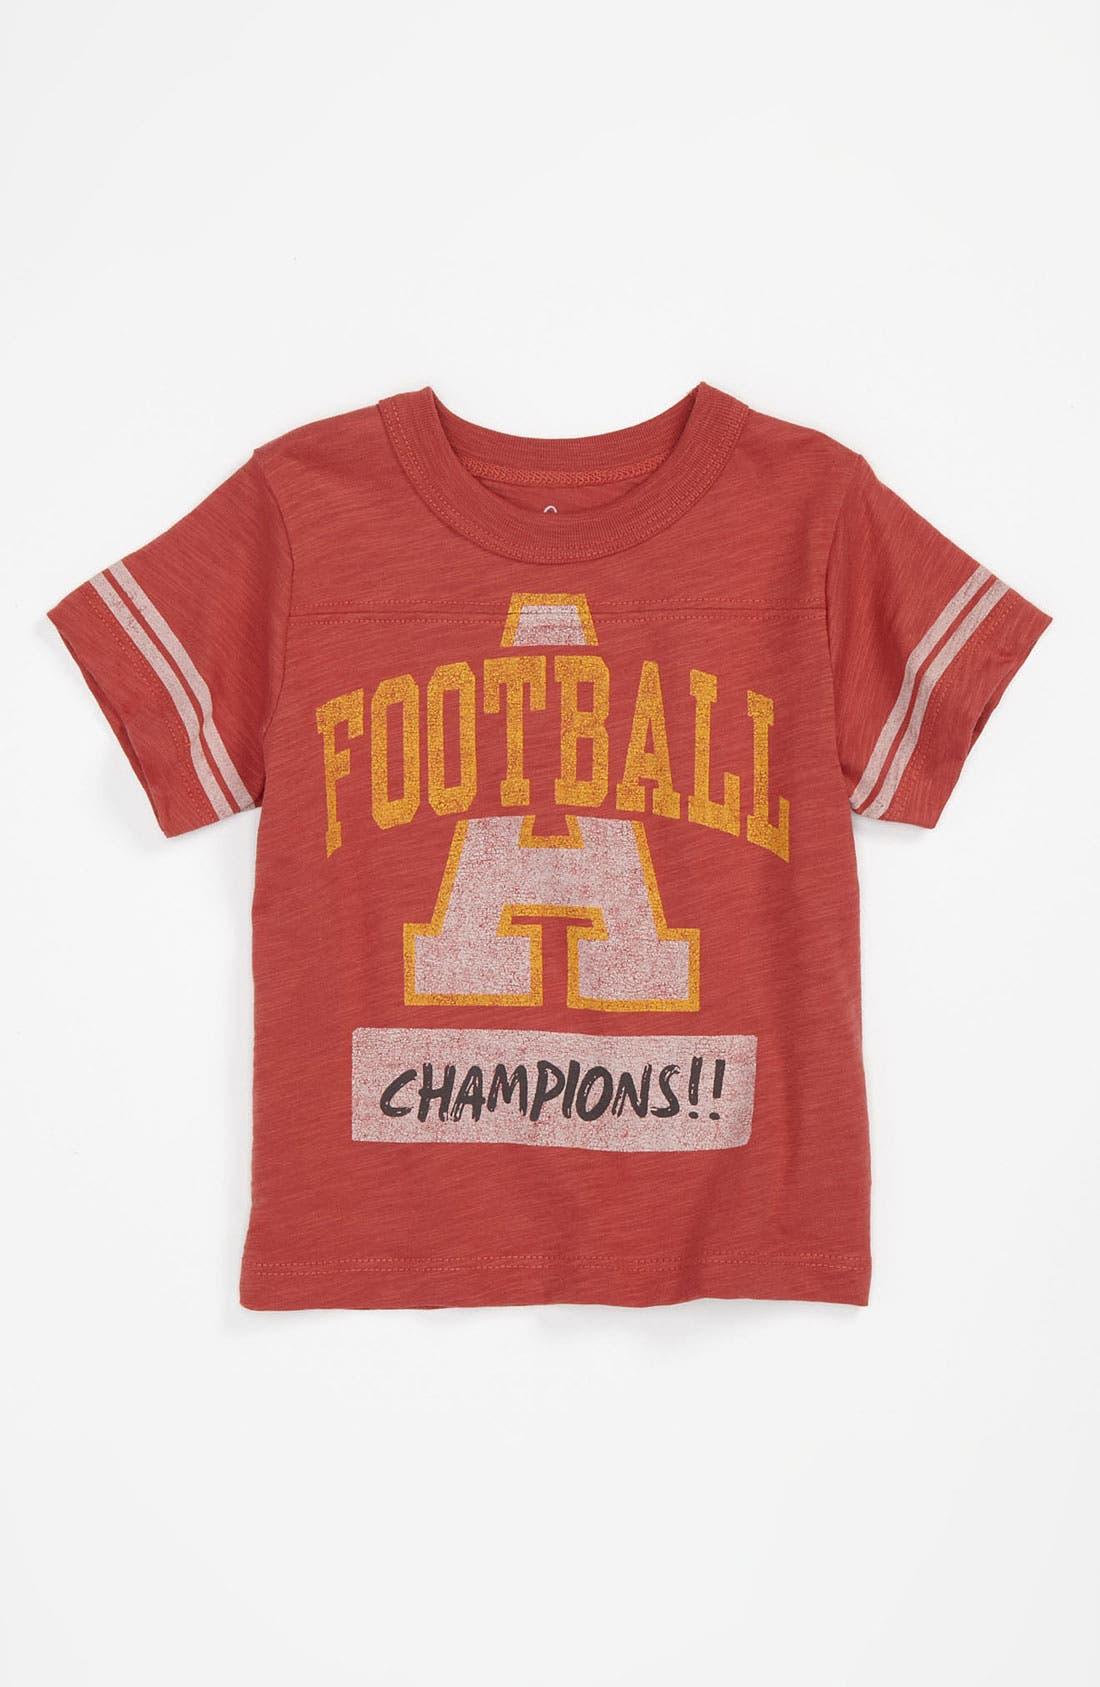 Alternate Image 1 Selected - Peek 'Football Champs' Jersey T-Shirt (Infant)